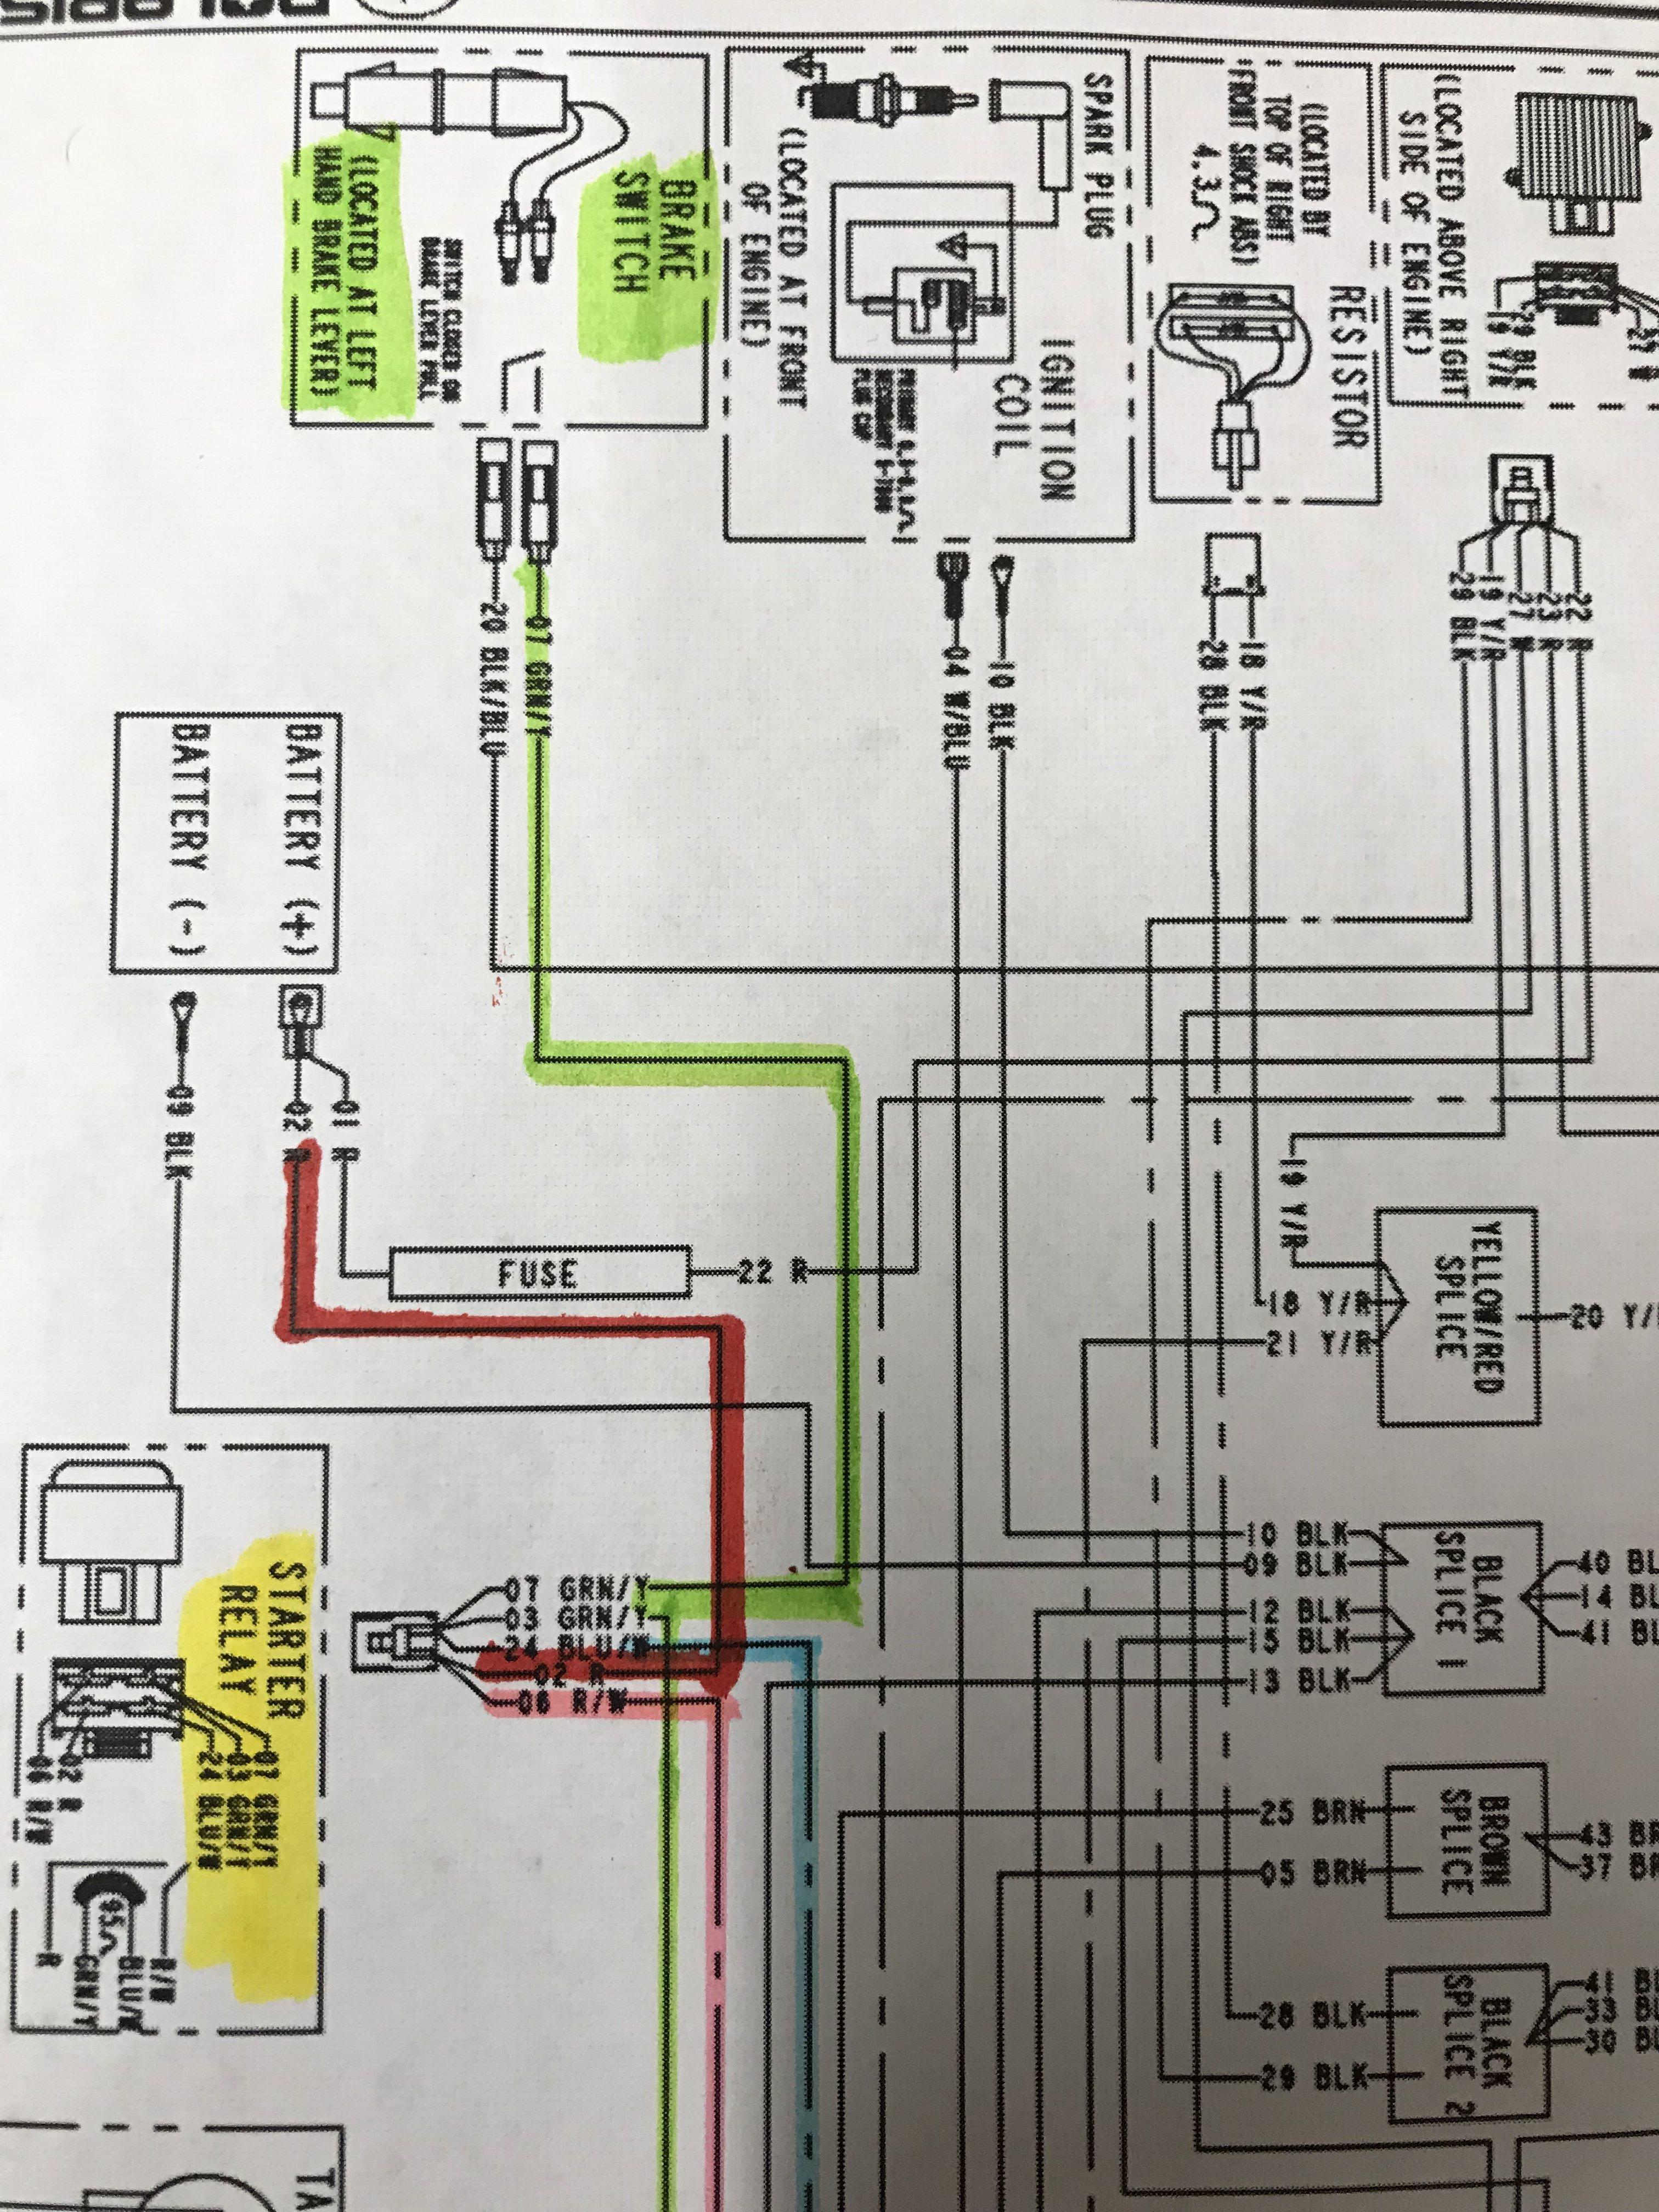 Wiring for my 2002 Polaris Scrambler 90 - Polaris ATV Forum - QUADCRAZY | Battery Cable Wiring Diagram Polaris Scrambler |  | QuadCRAZY